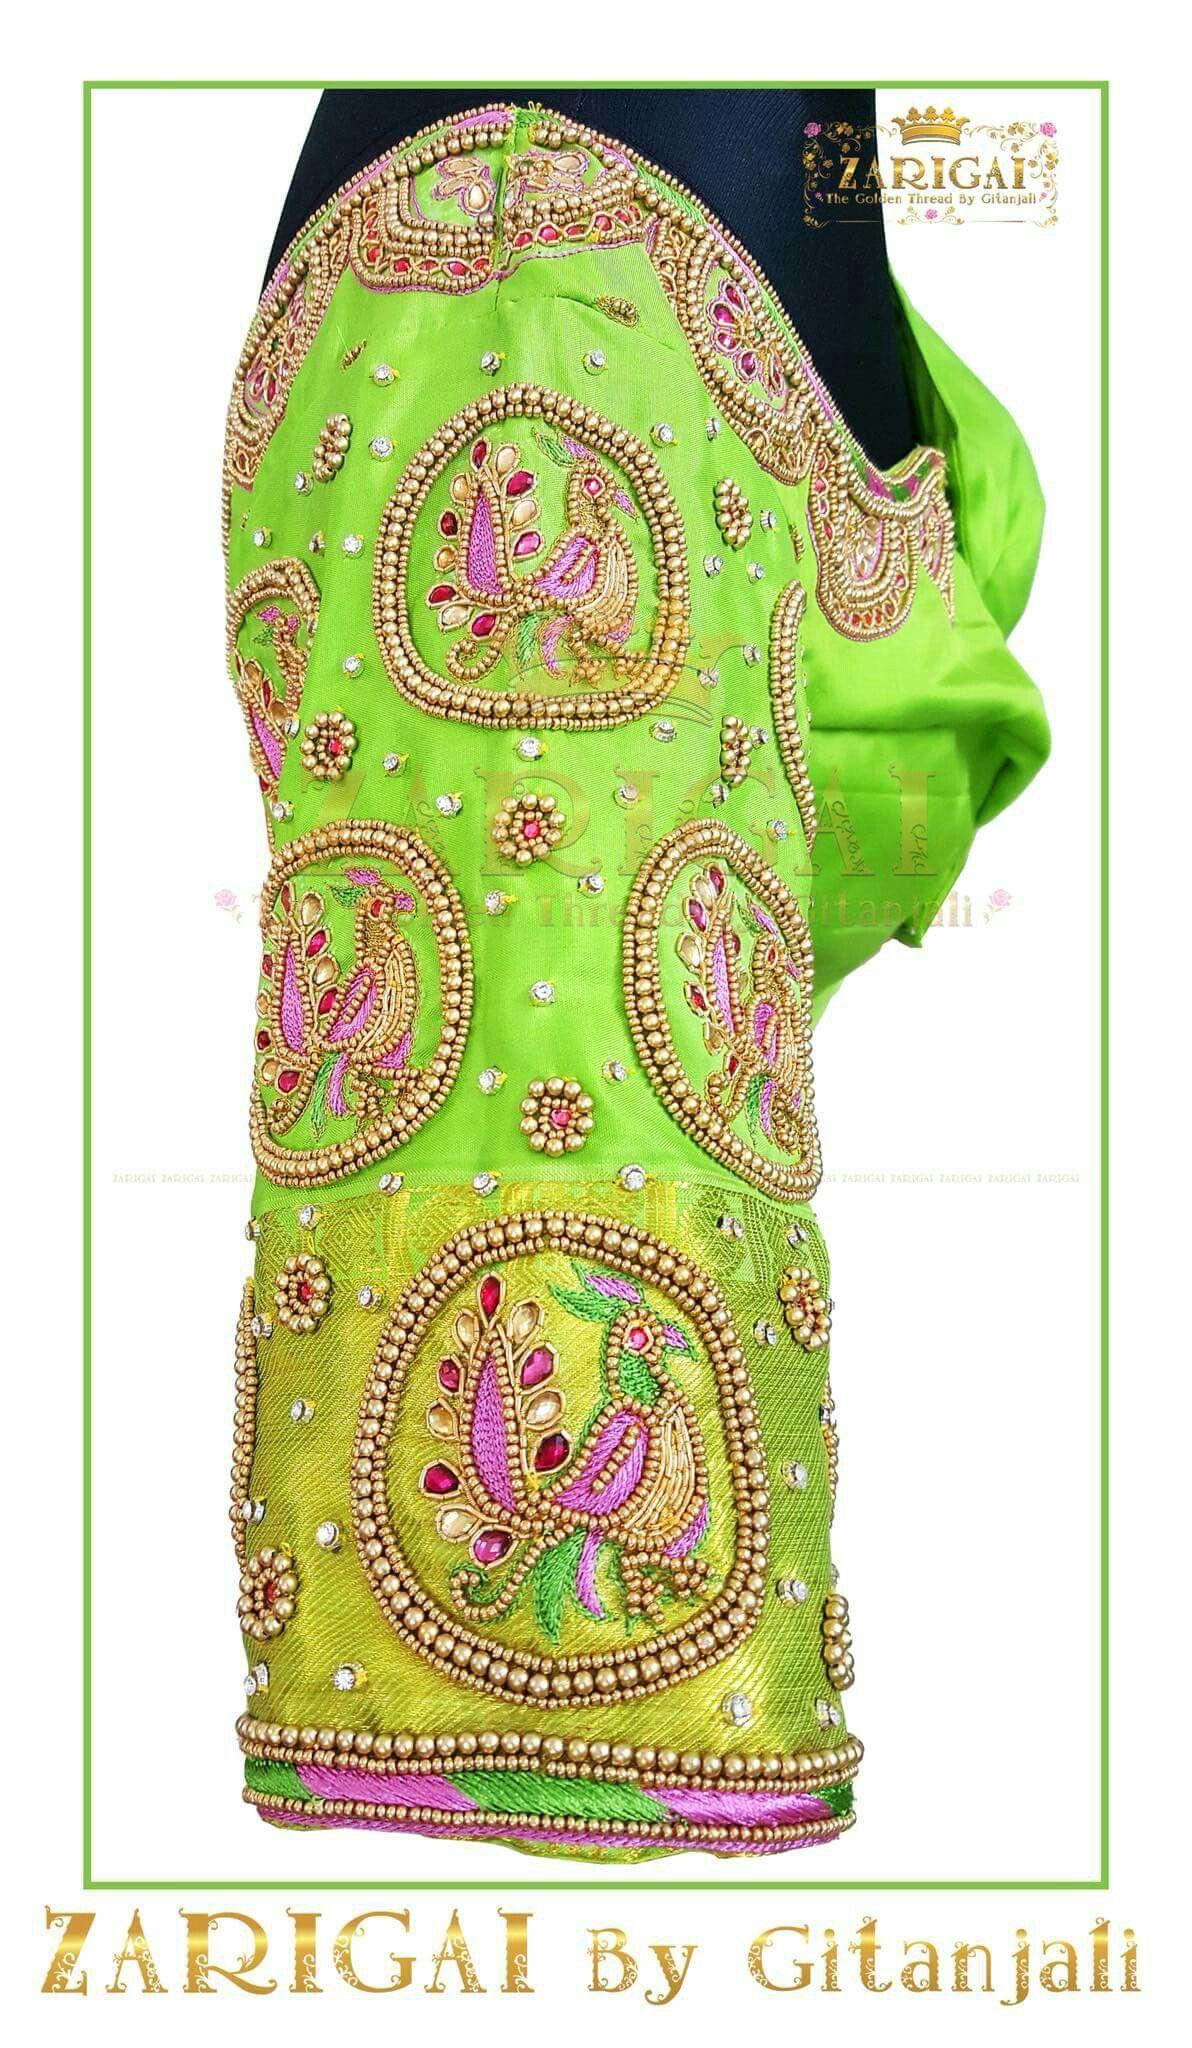 Silk saree blouse designs without embroidery pin by jayashakthi saravanan on blouse designs  pinterest  blouse